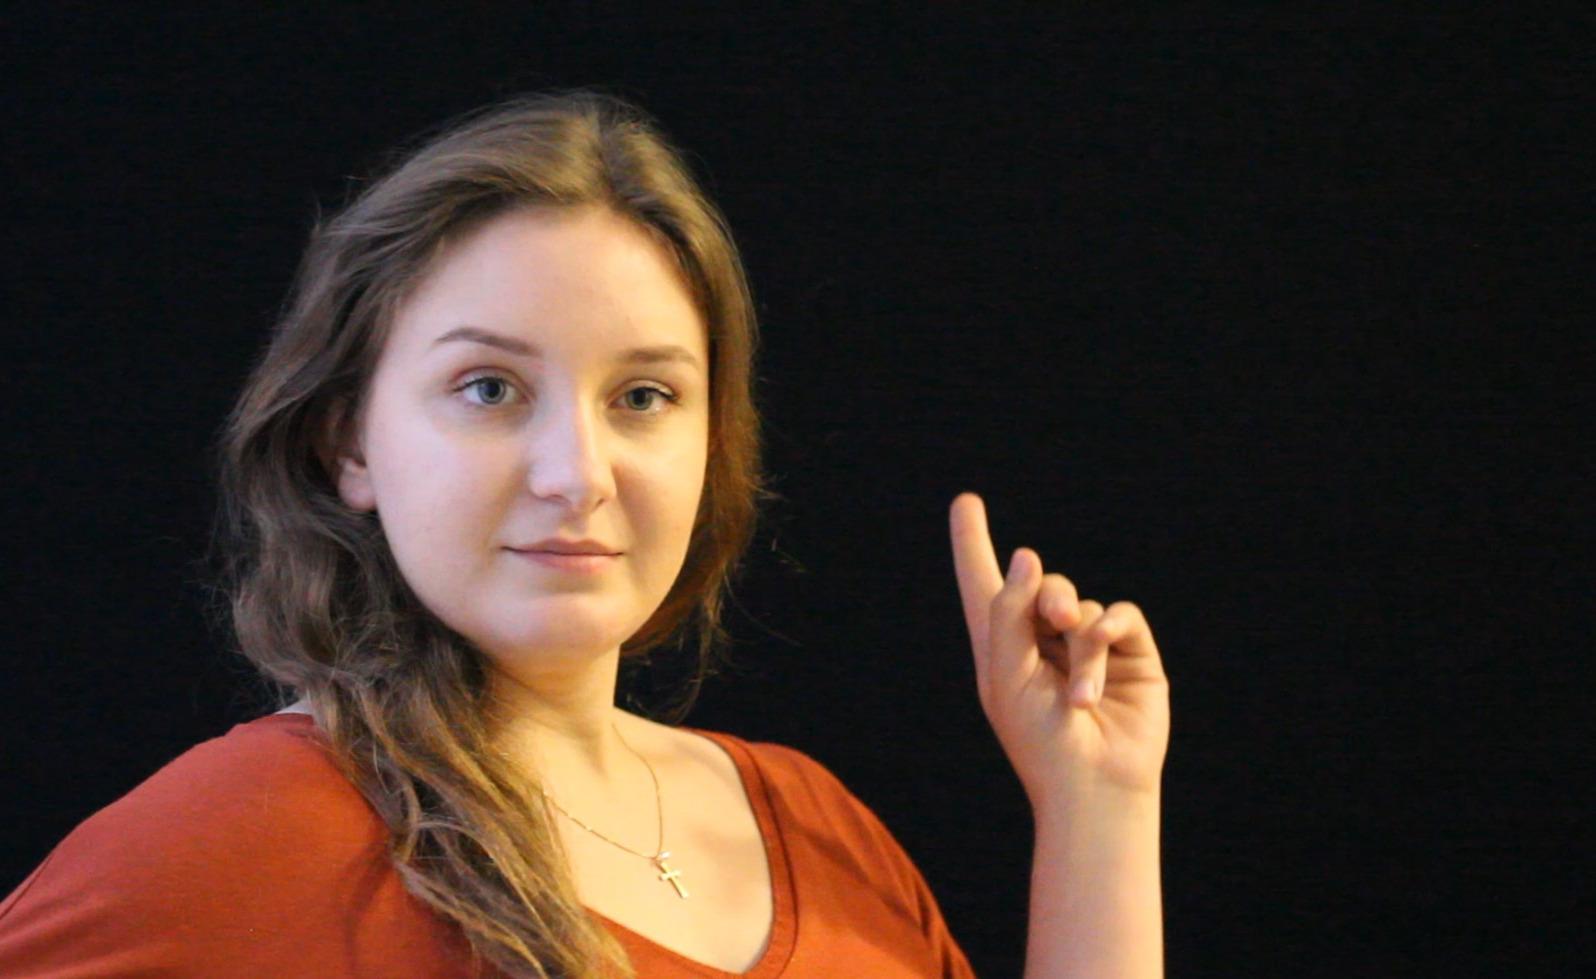 Ania Leniewaska